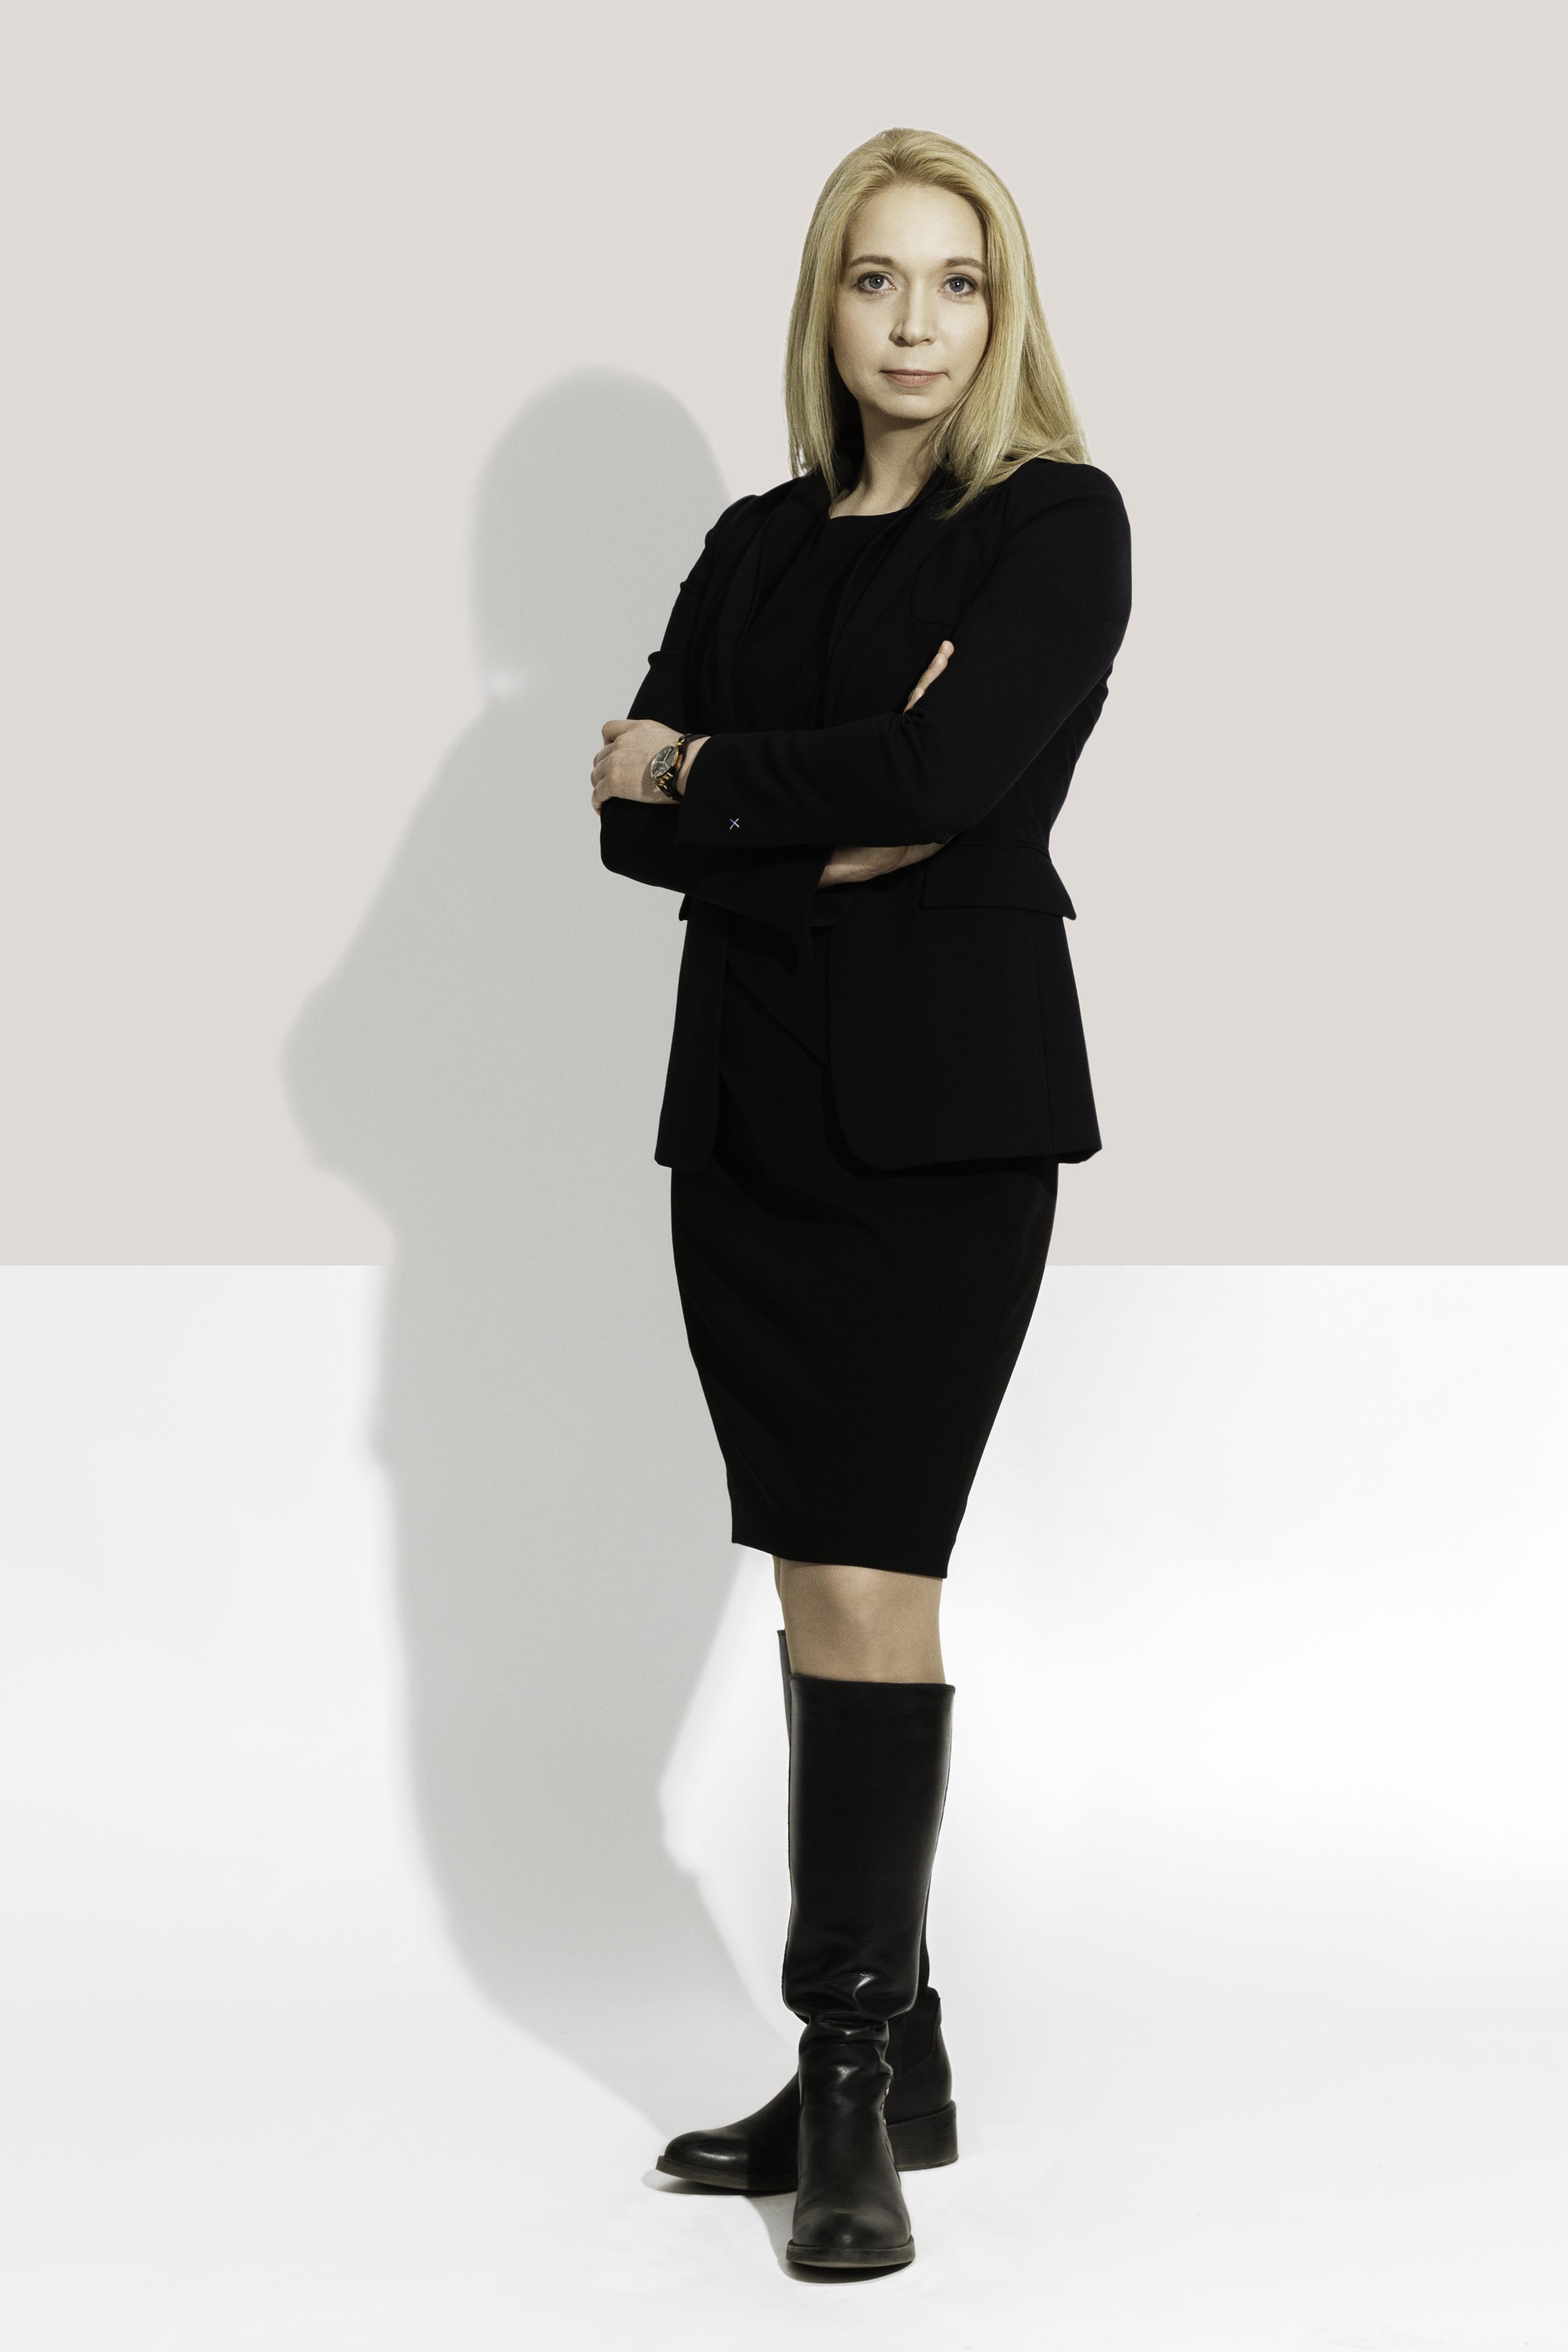 Kristiina Rebane